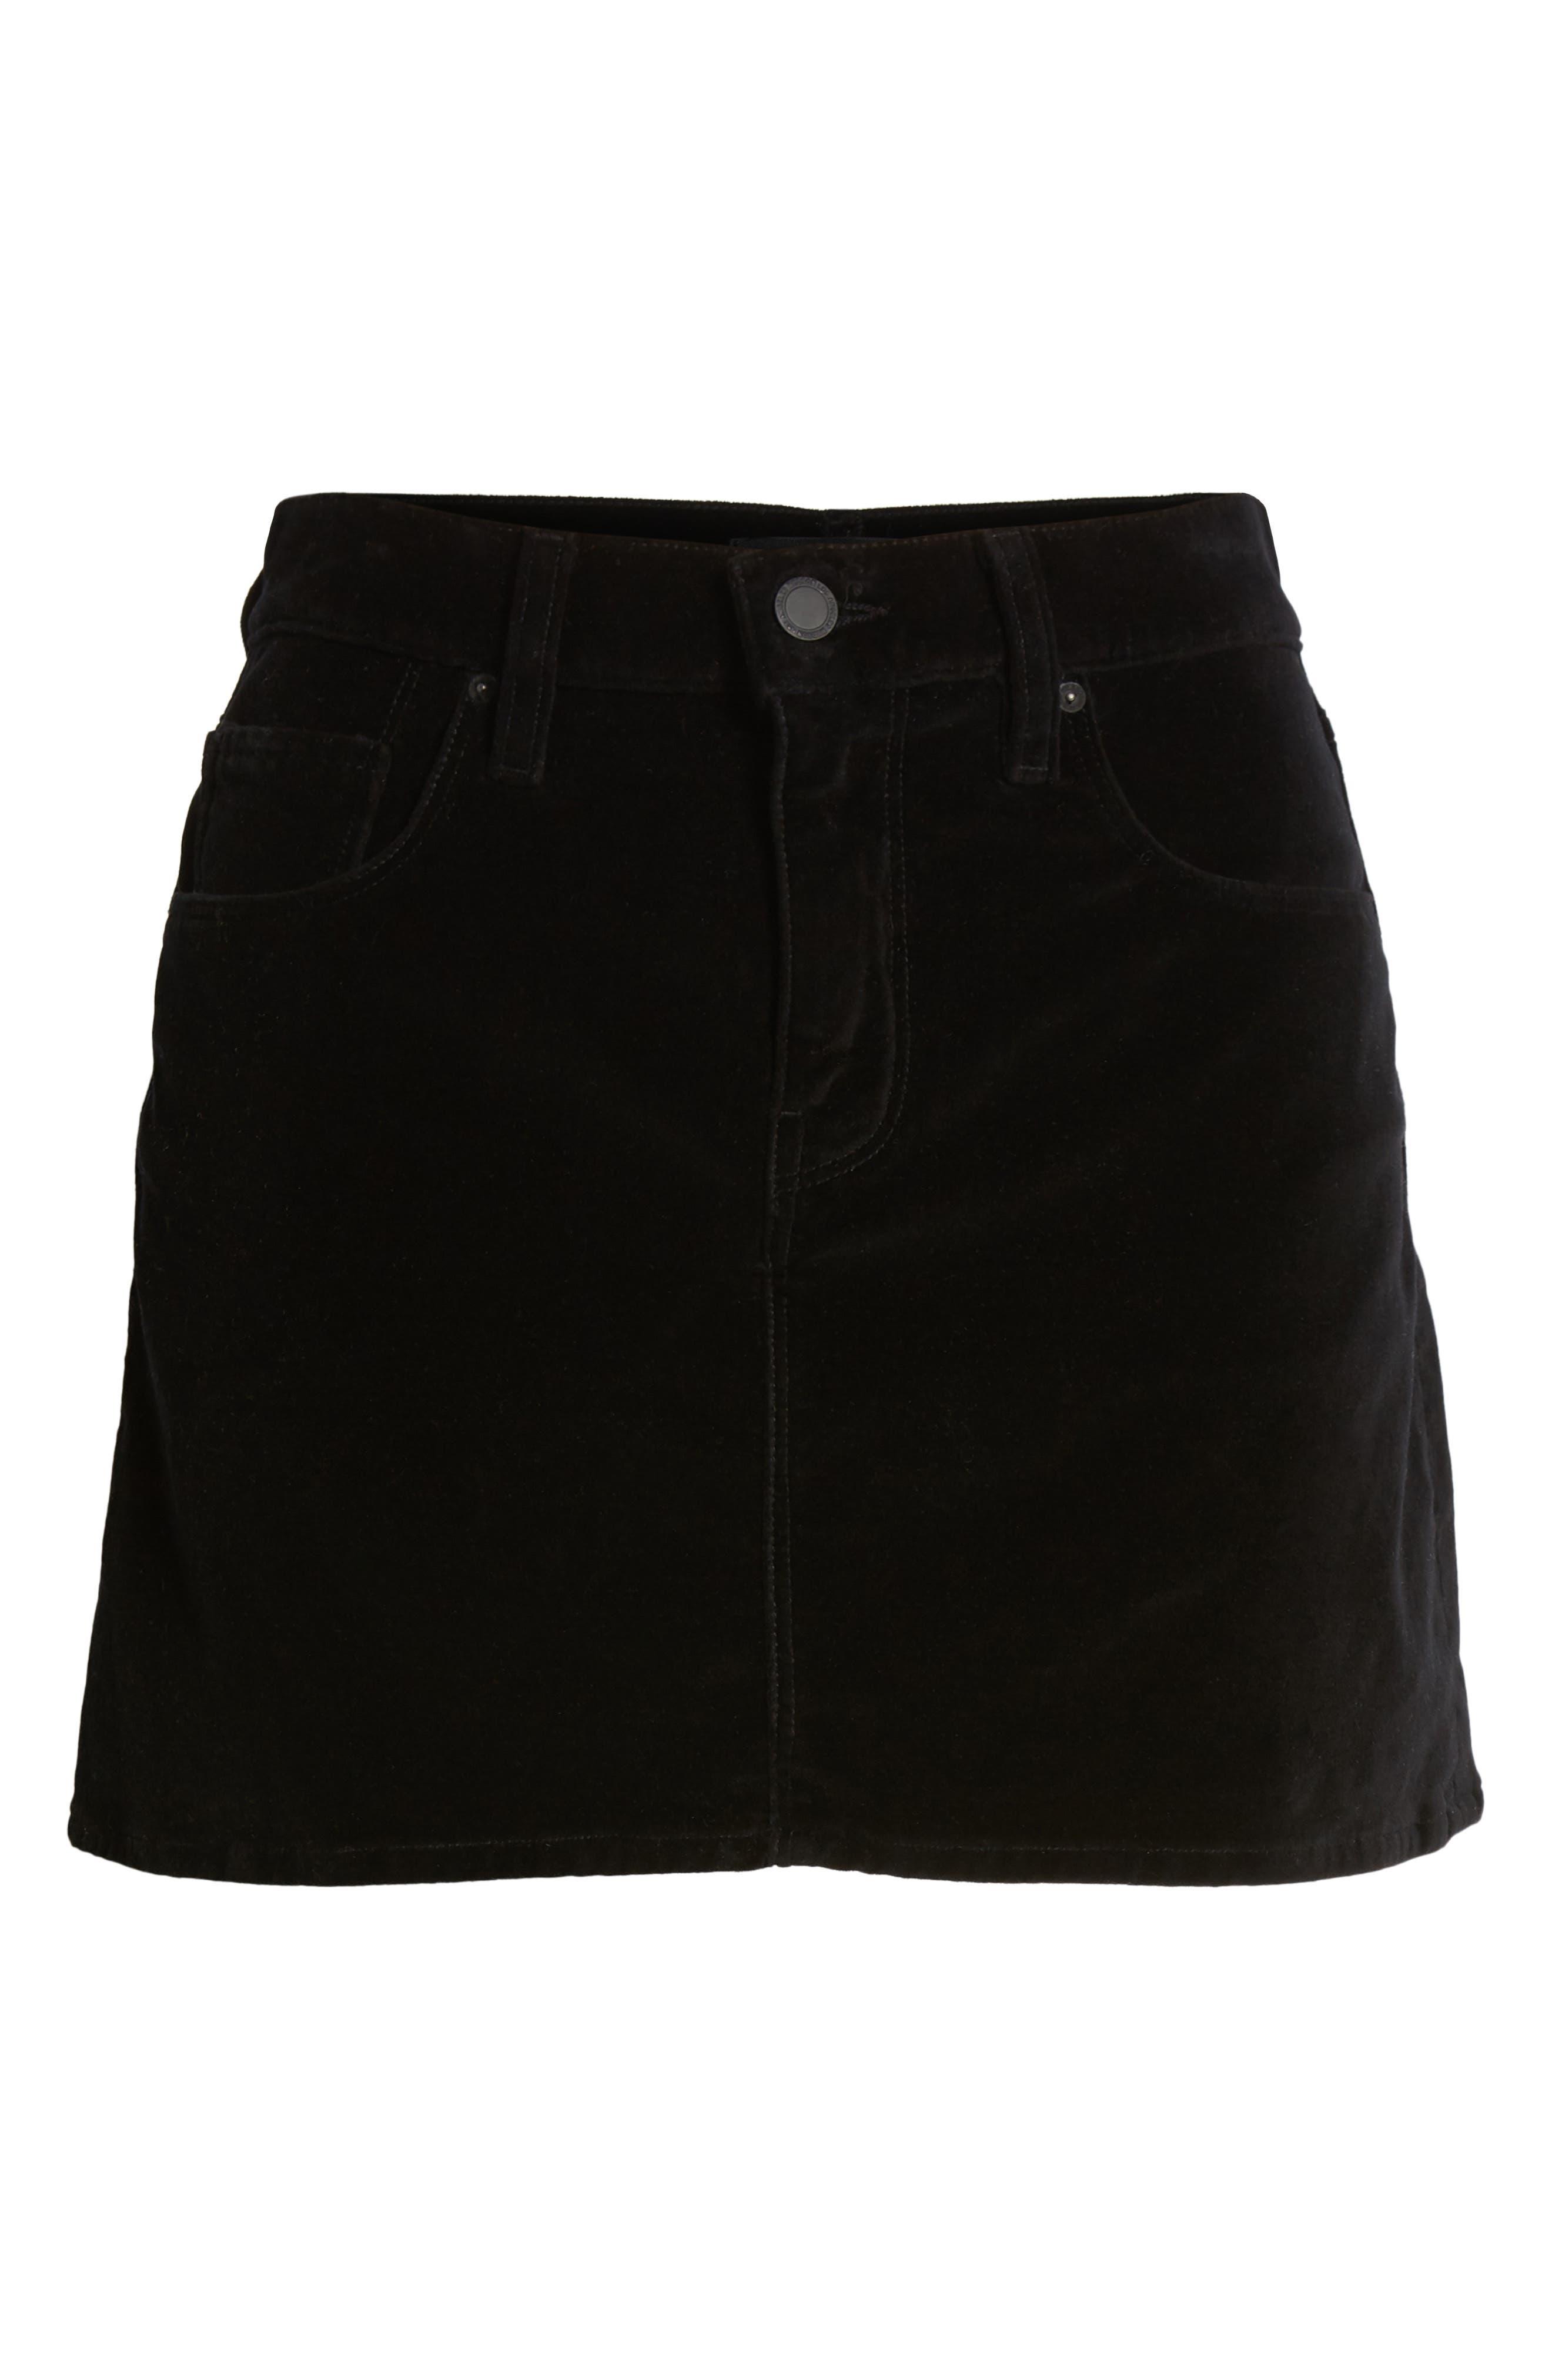 HUDSON JEANS,                             Hudson The Viper Miniskirt,                             Alternate thumbnail 6, color,                             001